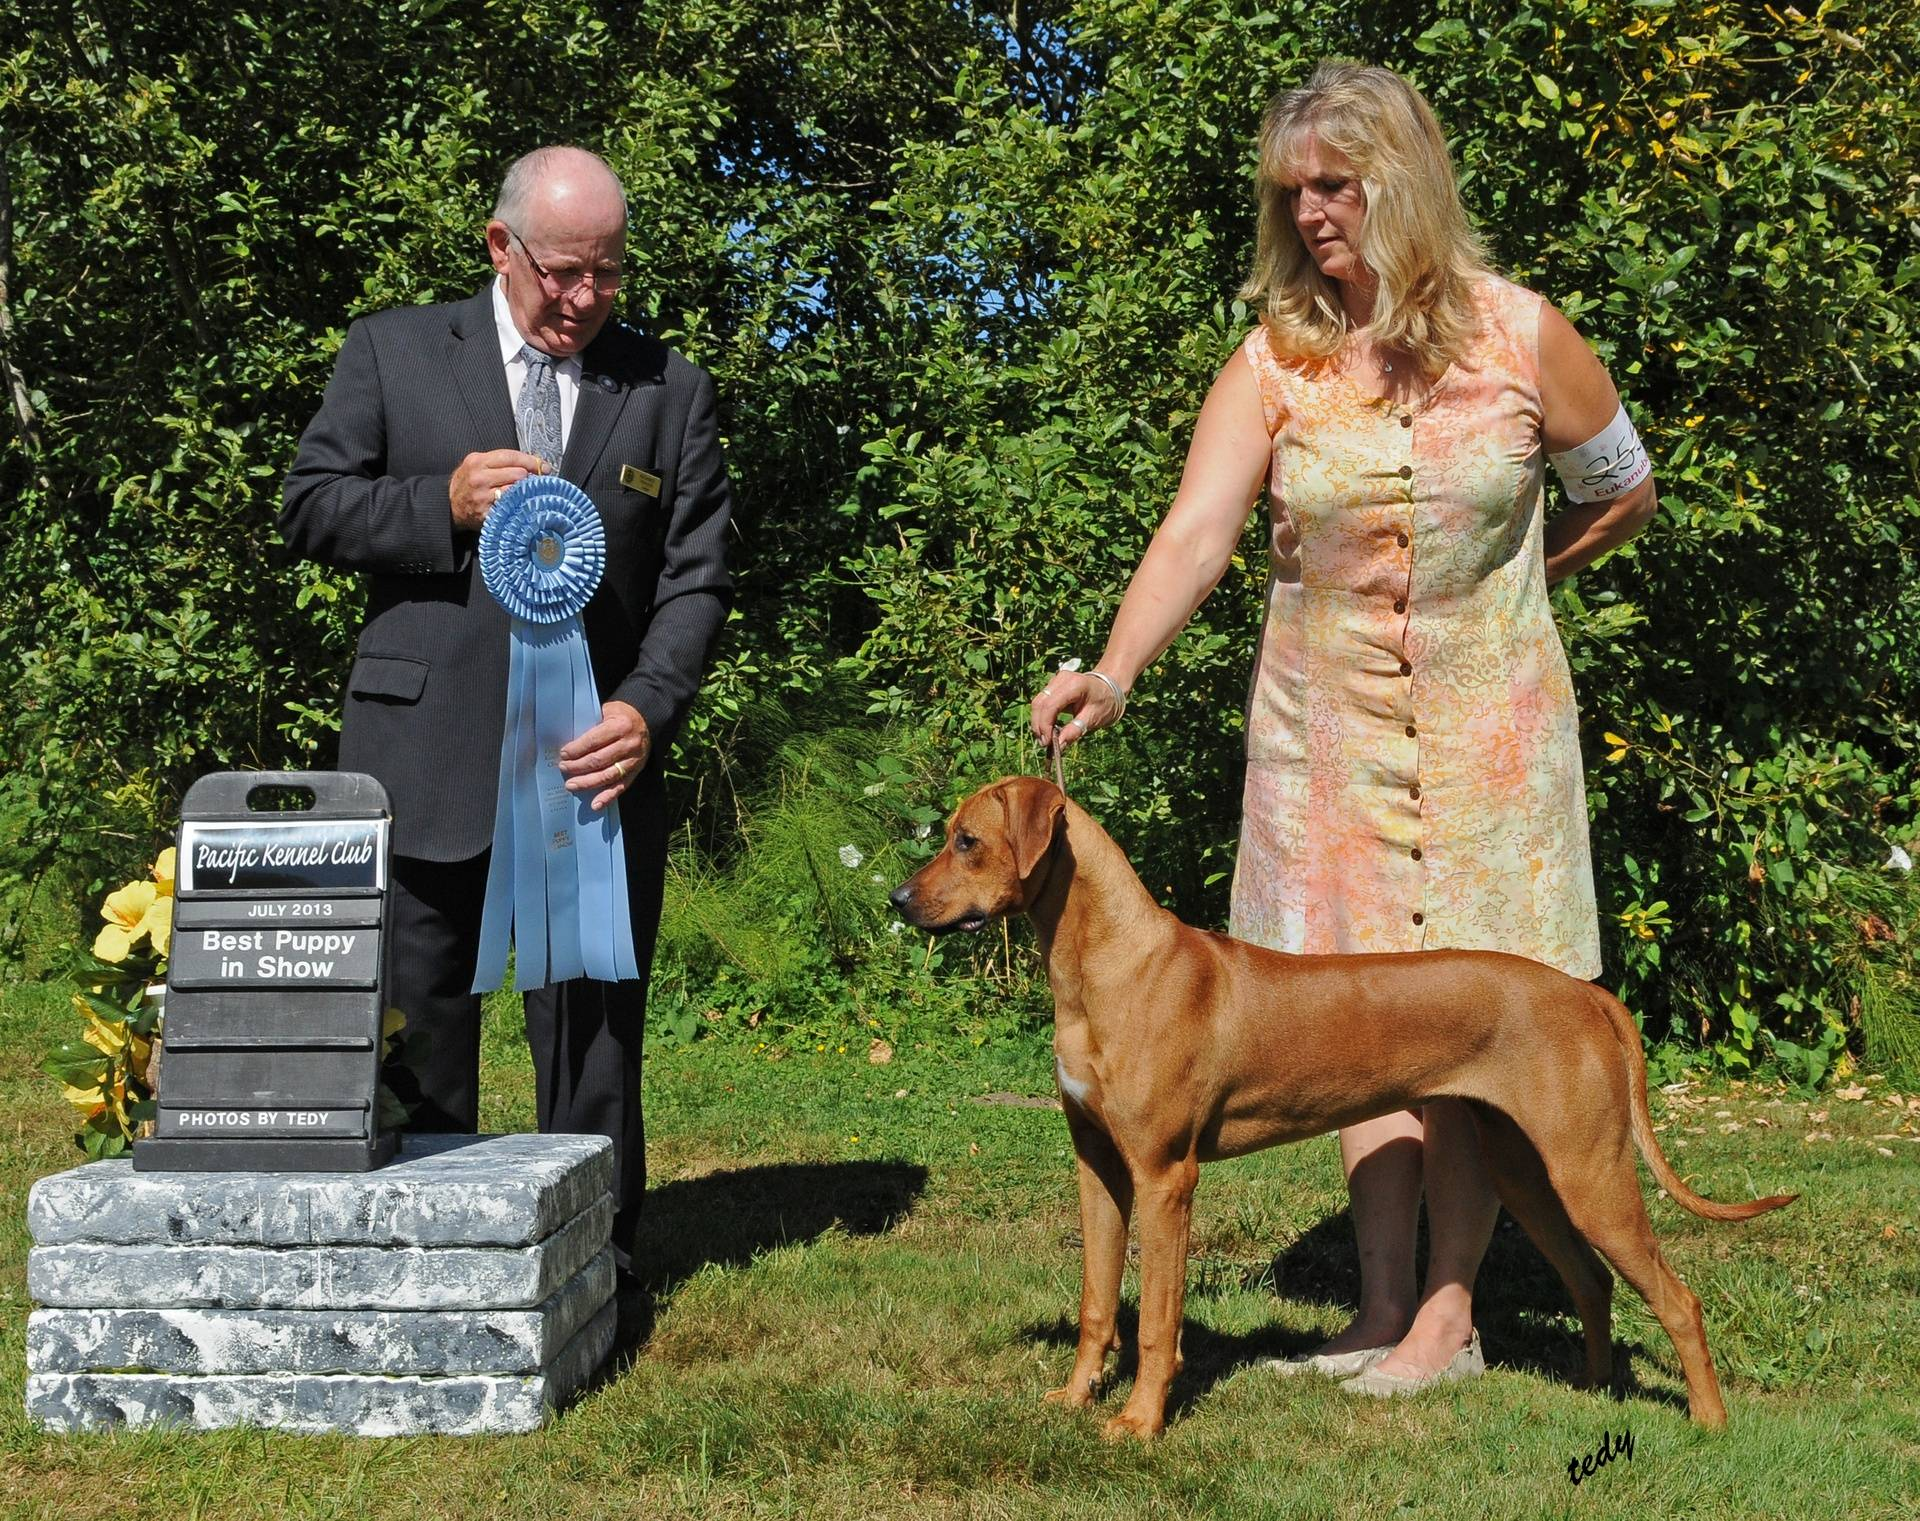 Askher first show--Best Puppy In Show